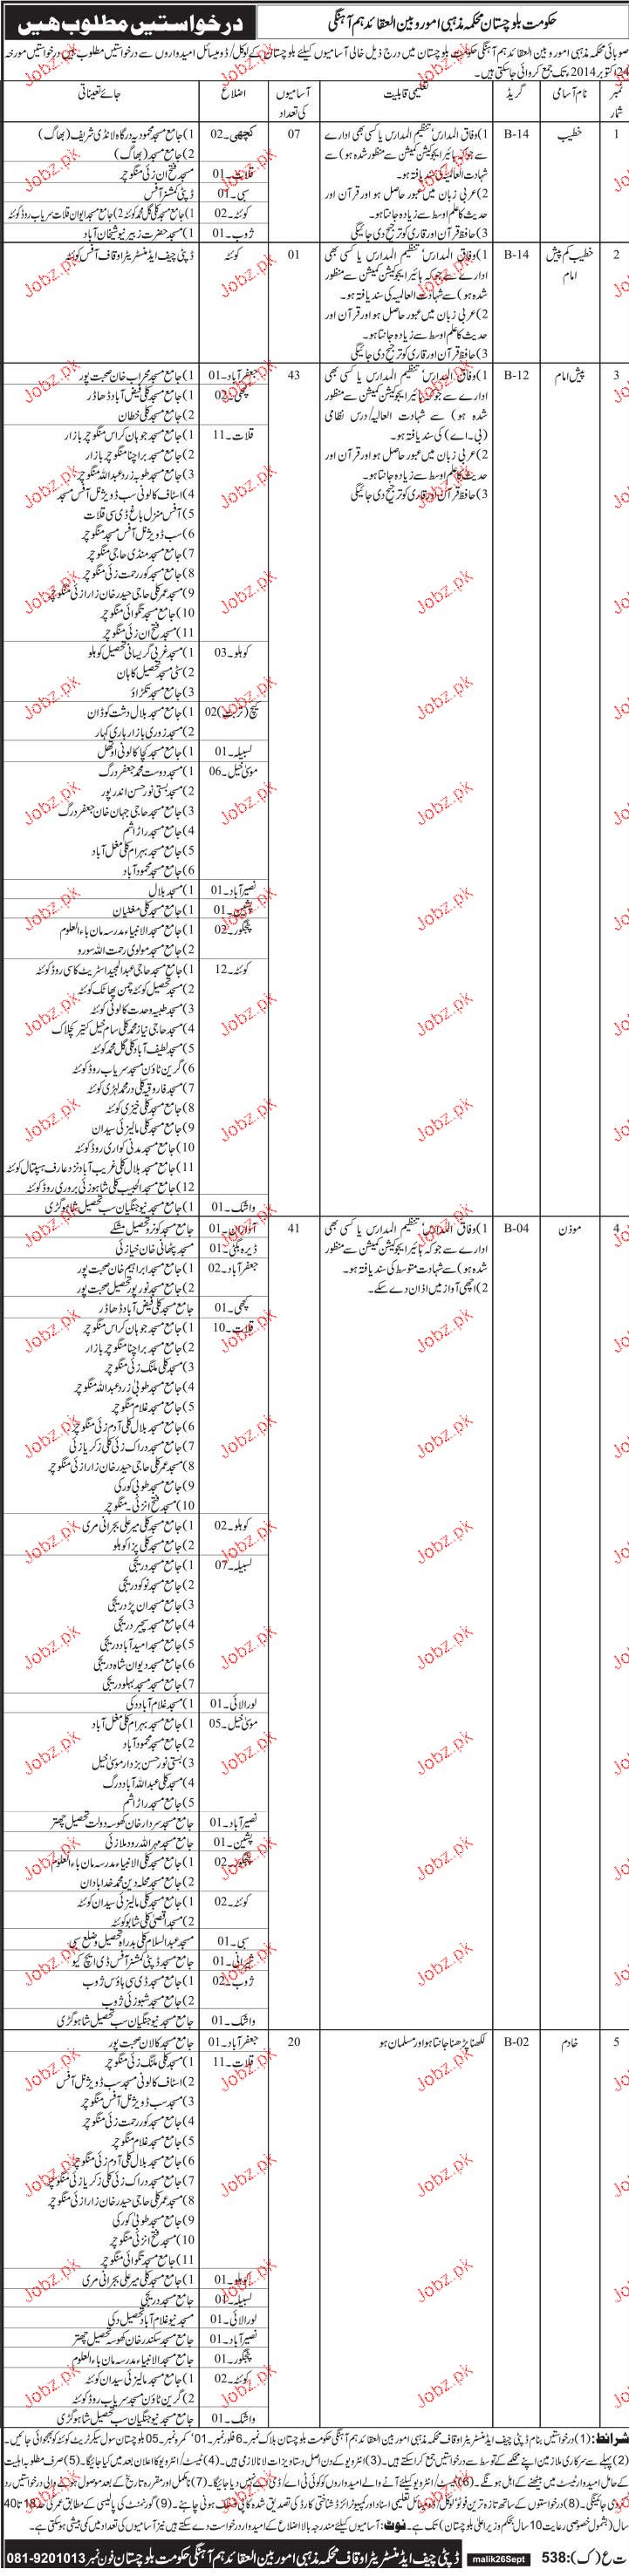 Khatteb, Pash Immam, Moazan and Khadim Job Opportunity